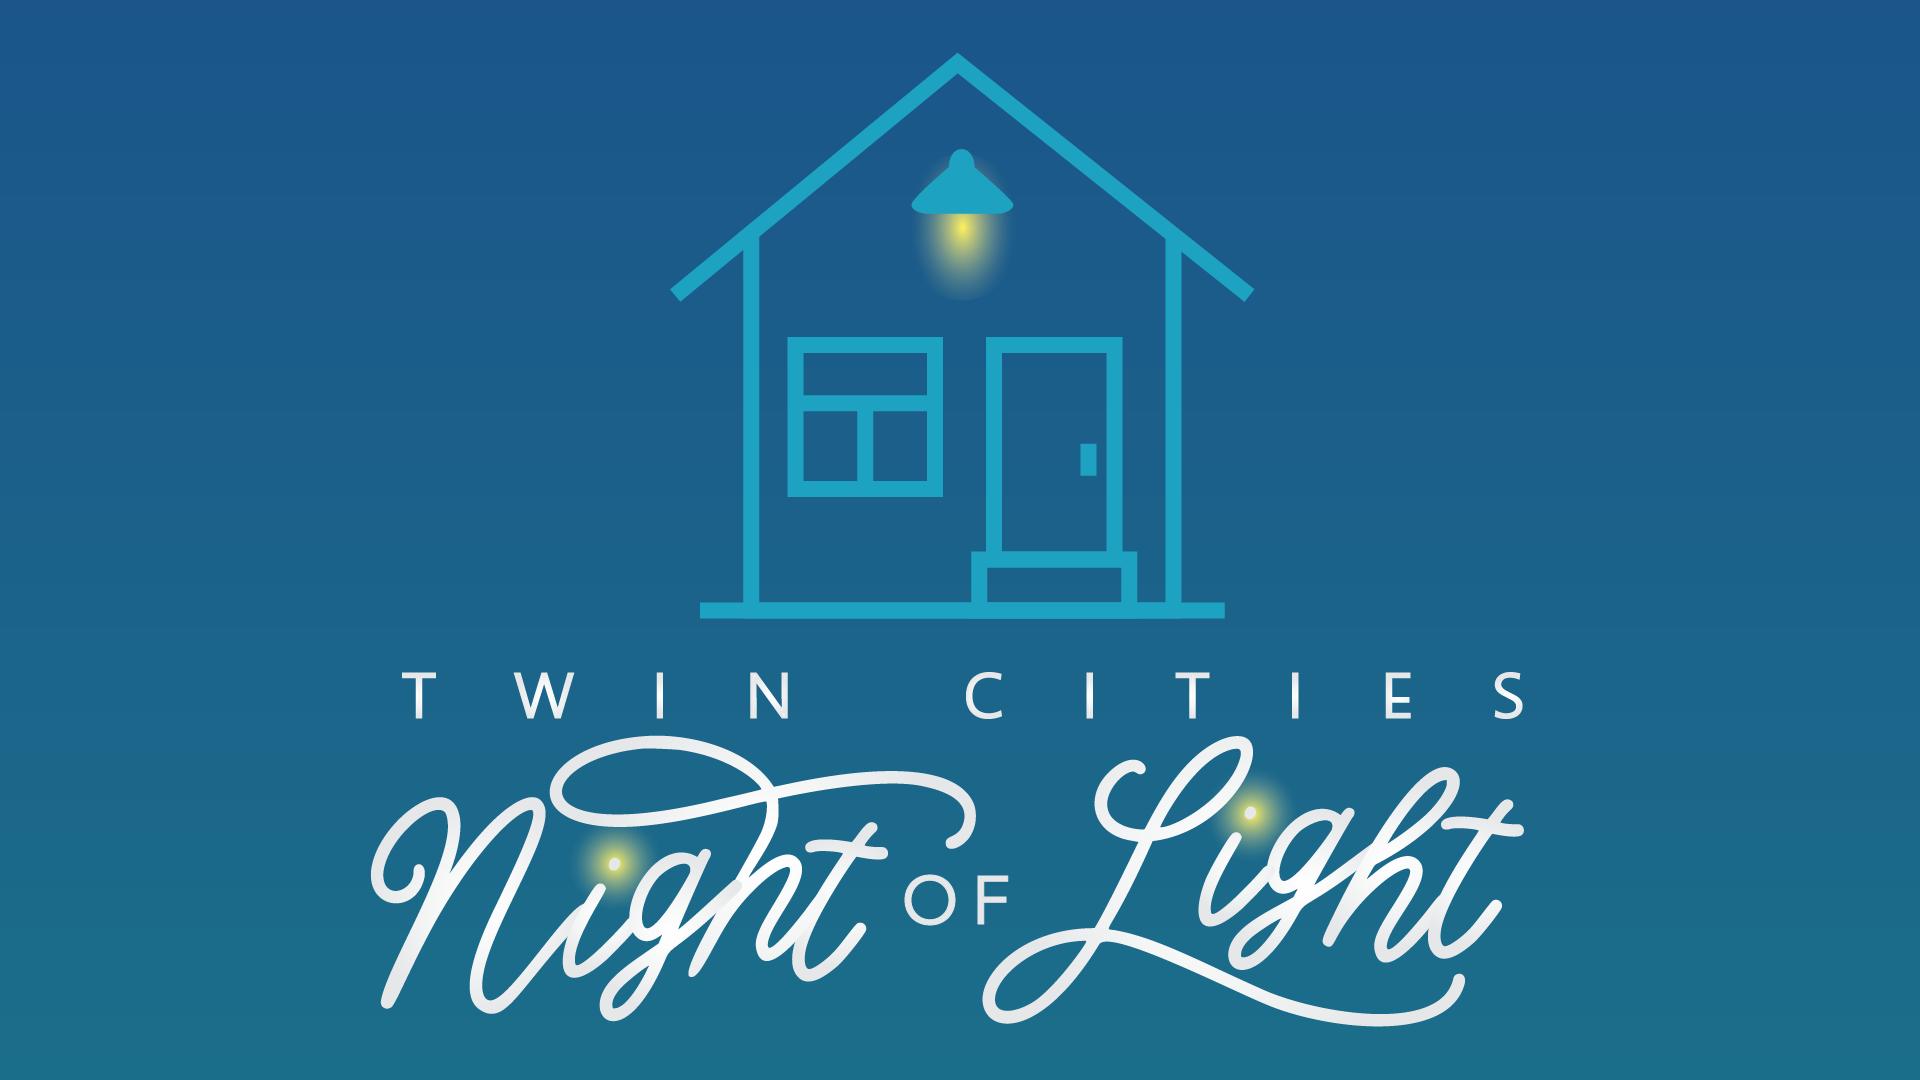 Twin Cities Night of Light